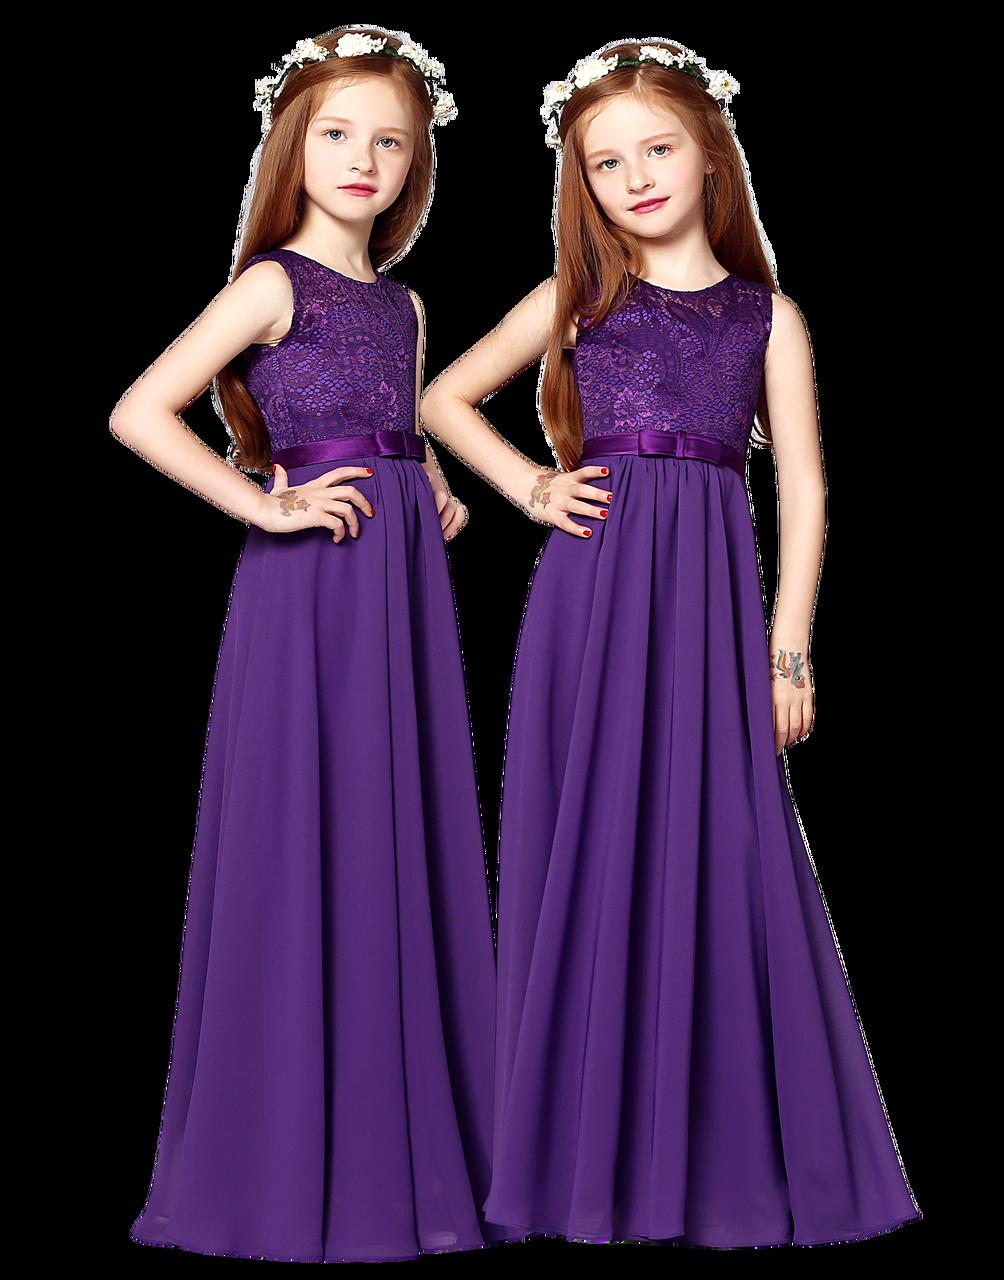 Charming Chiffon Princess Flowergirl Party Junior Wedding Bridesmaid Dress 6-14